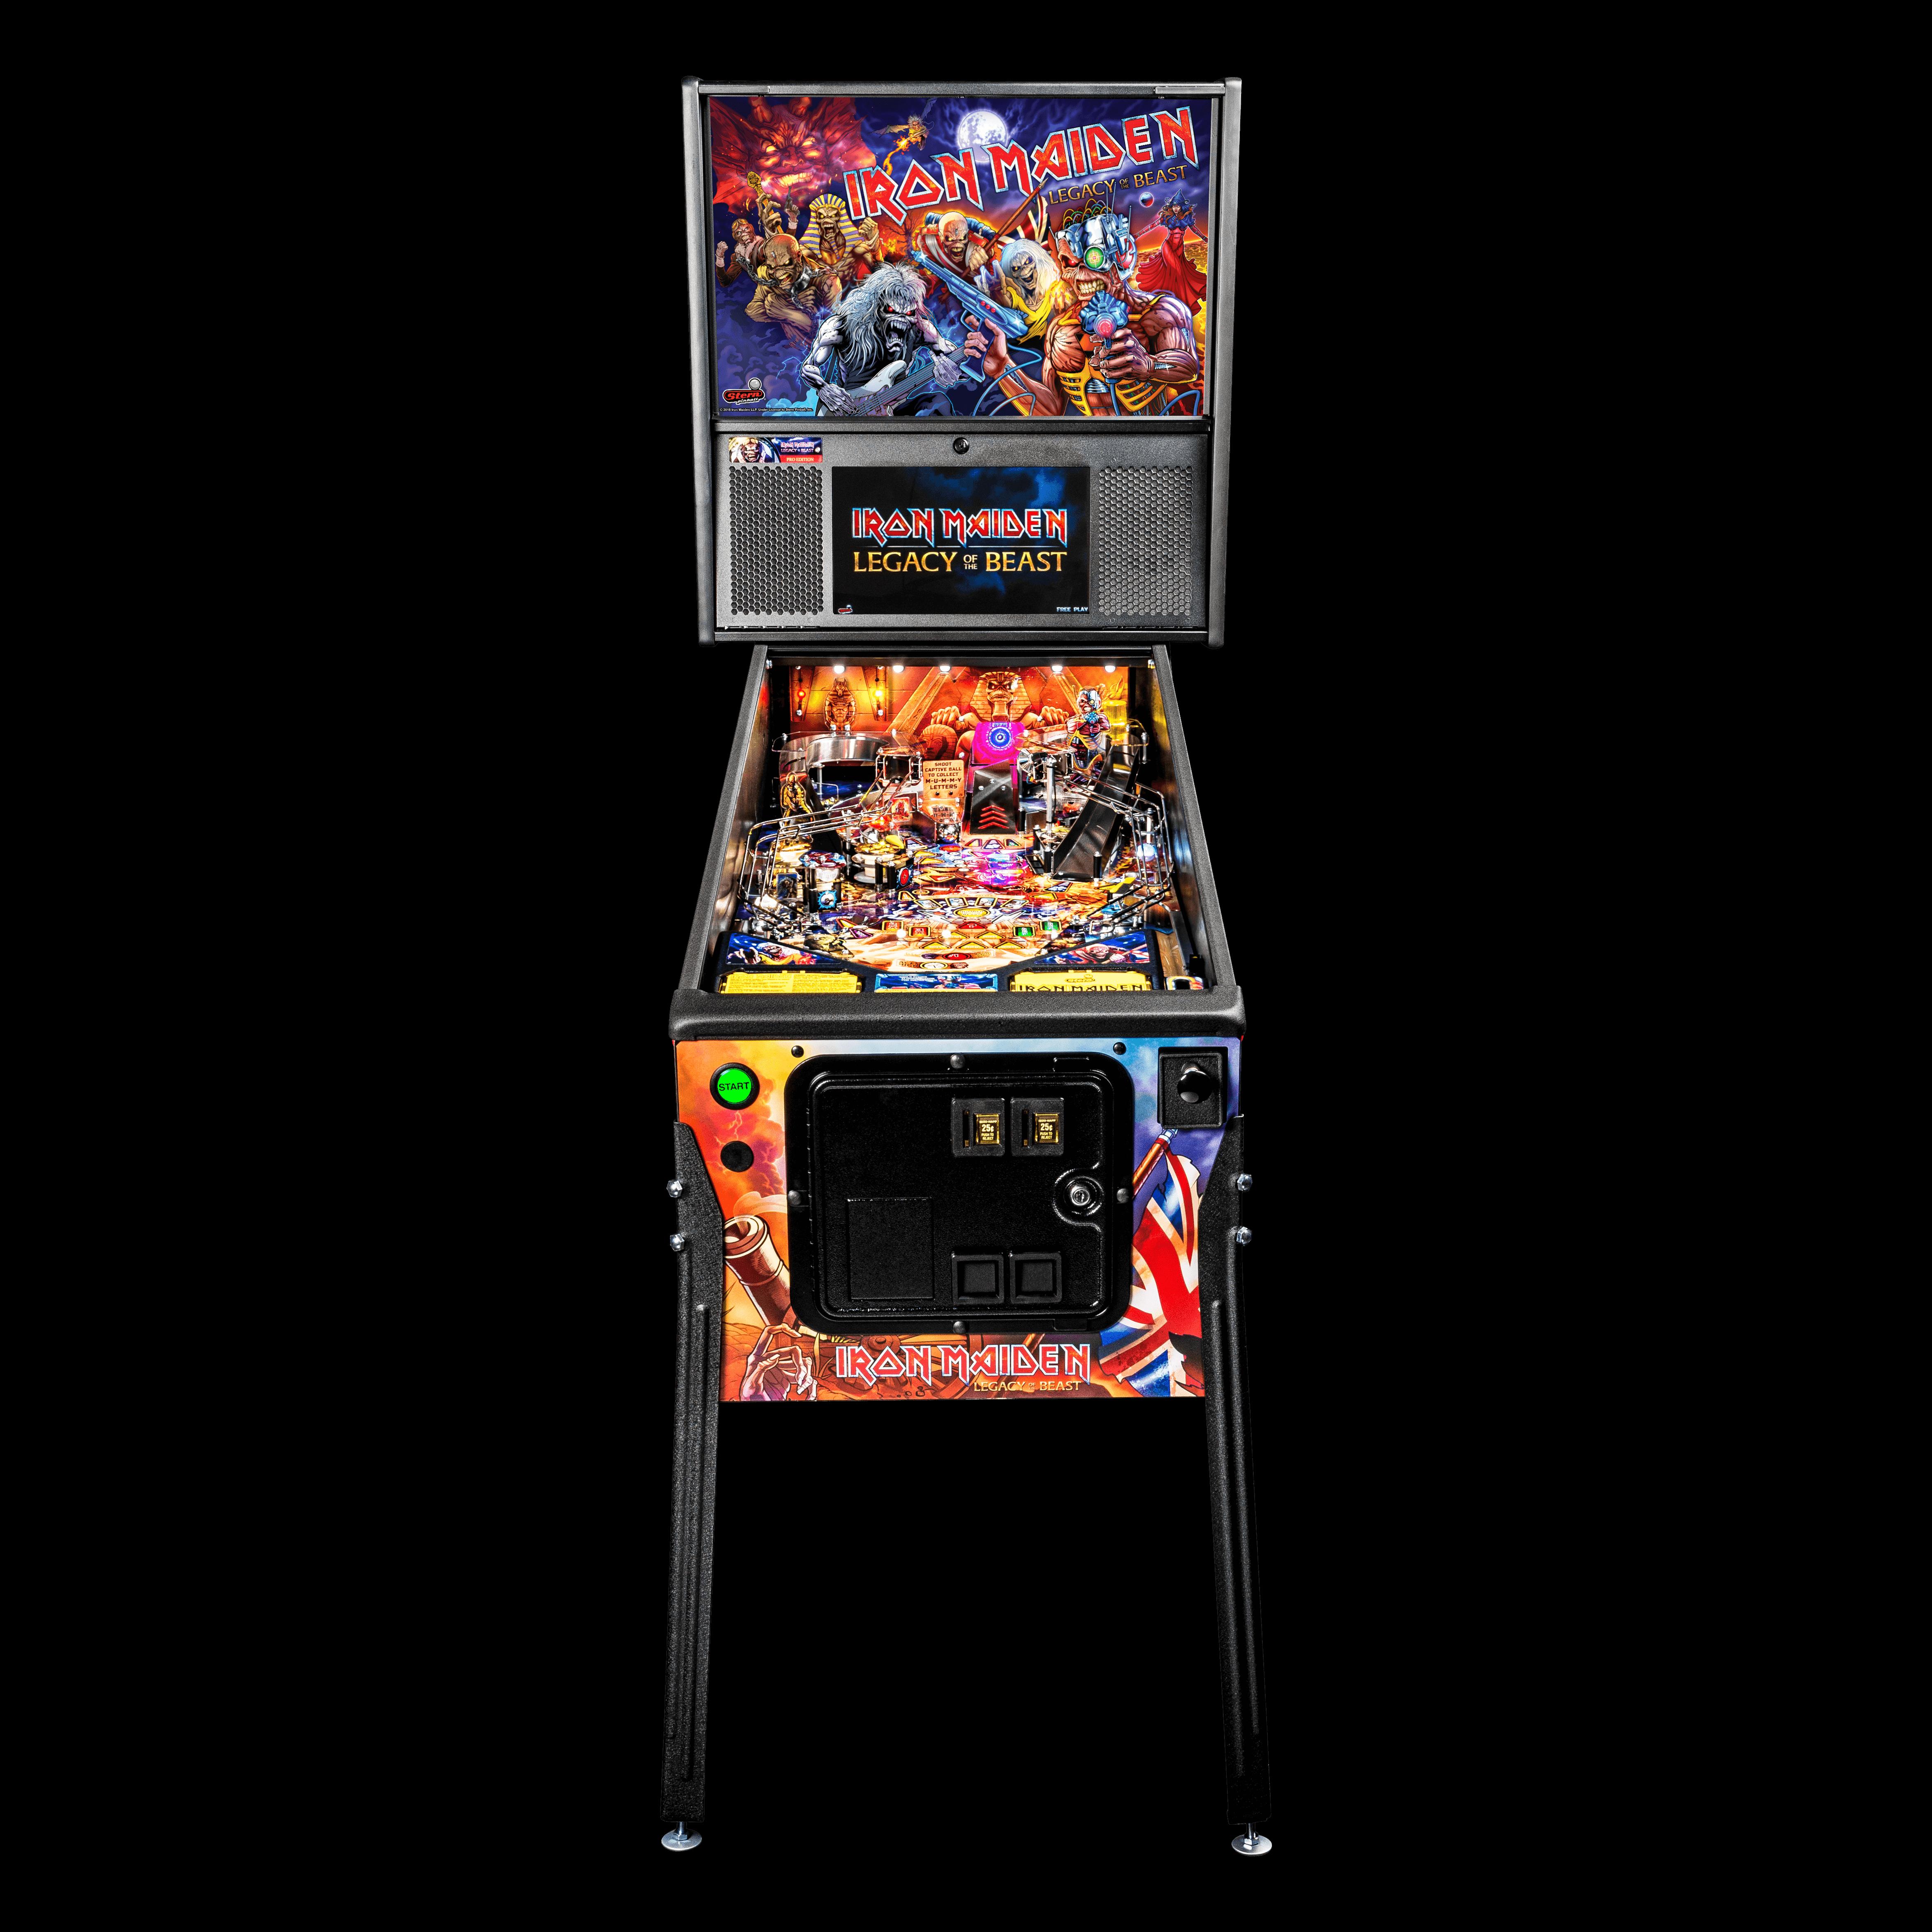 Iron Maiden Pro Pinball Machine by Stern